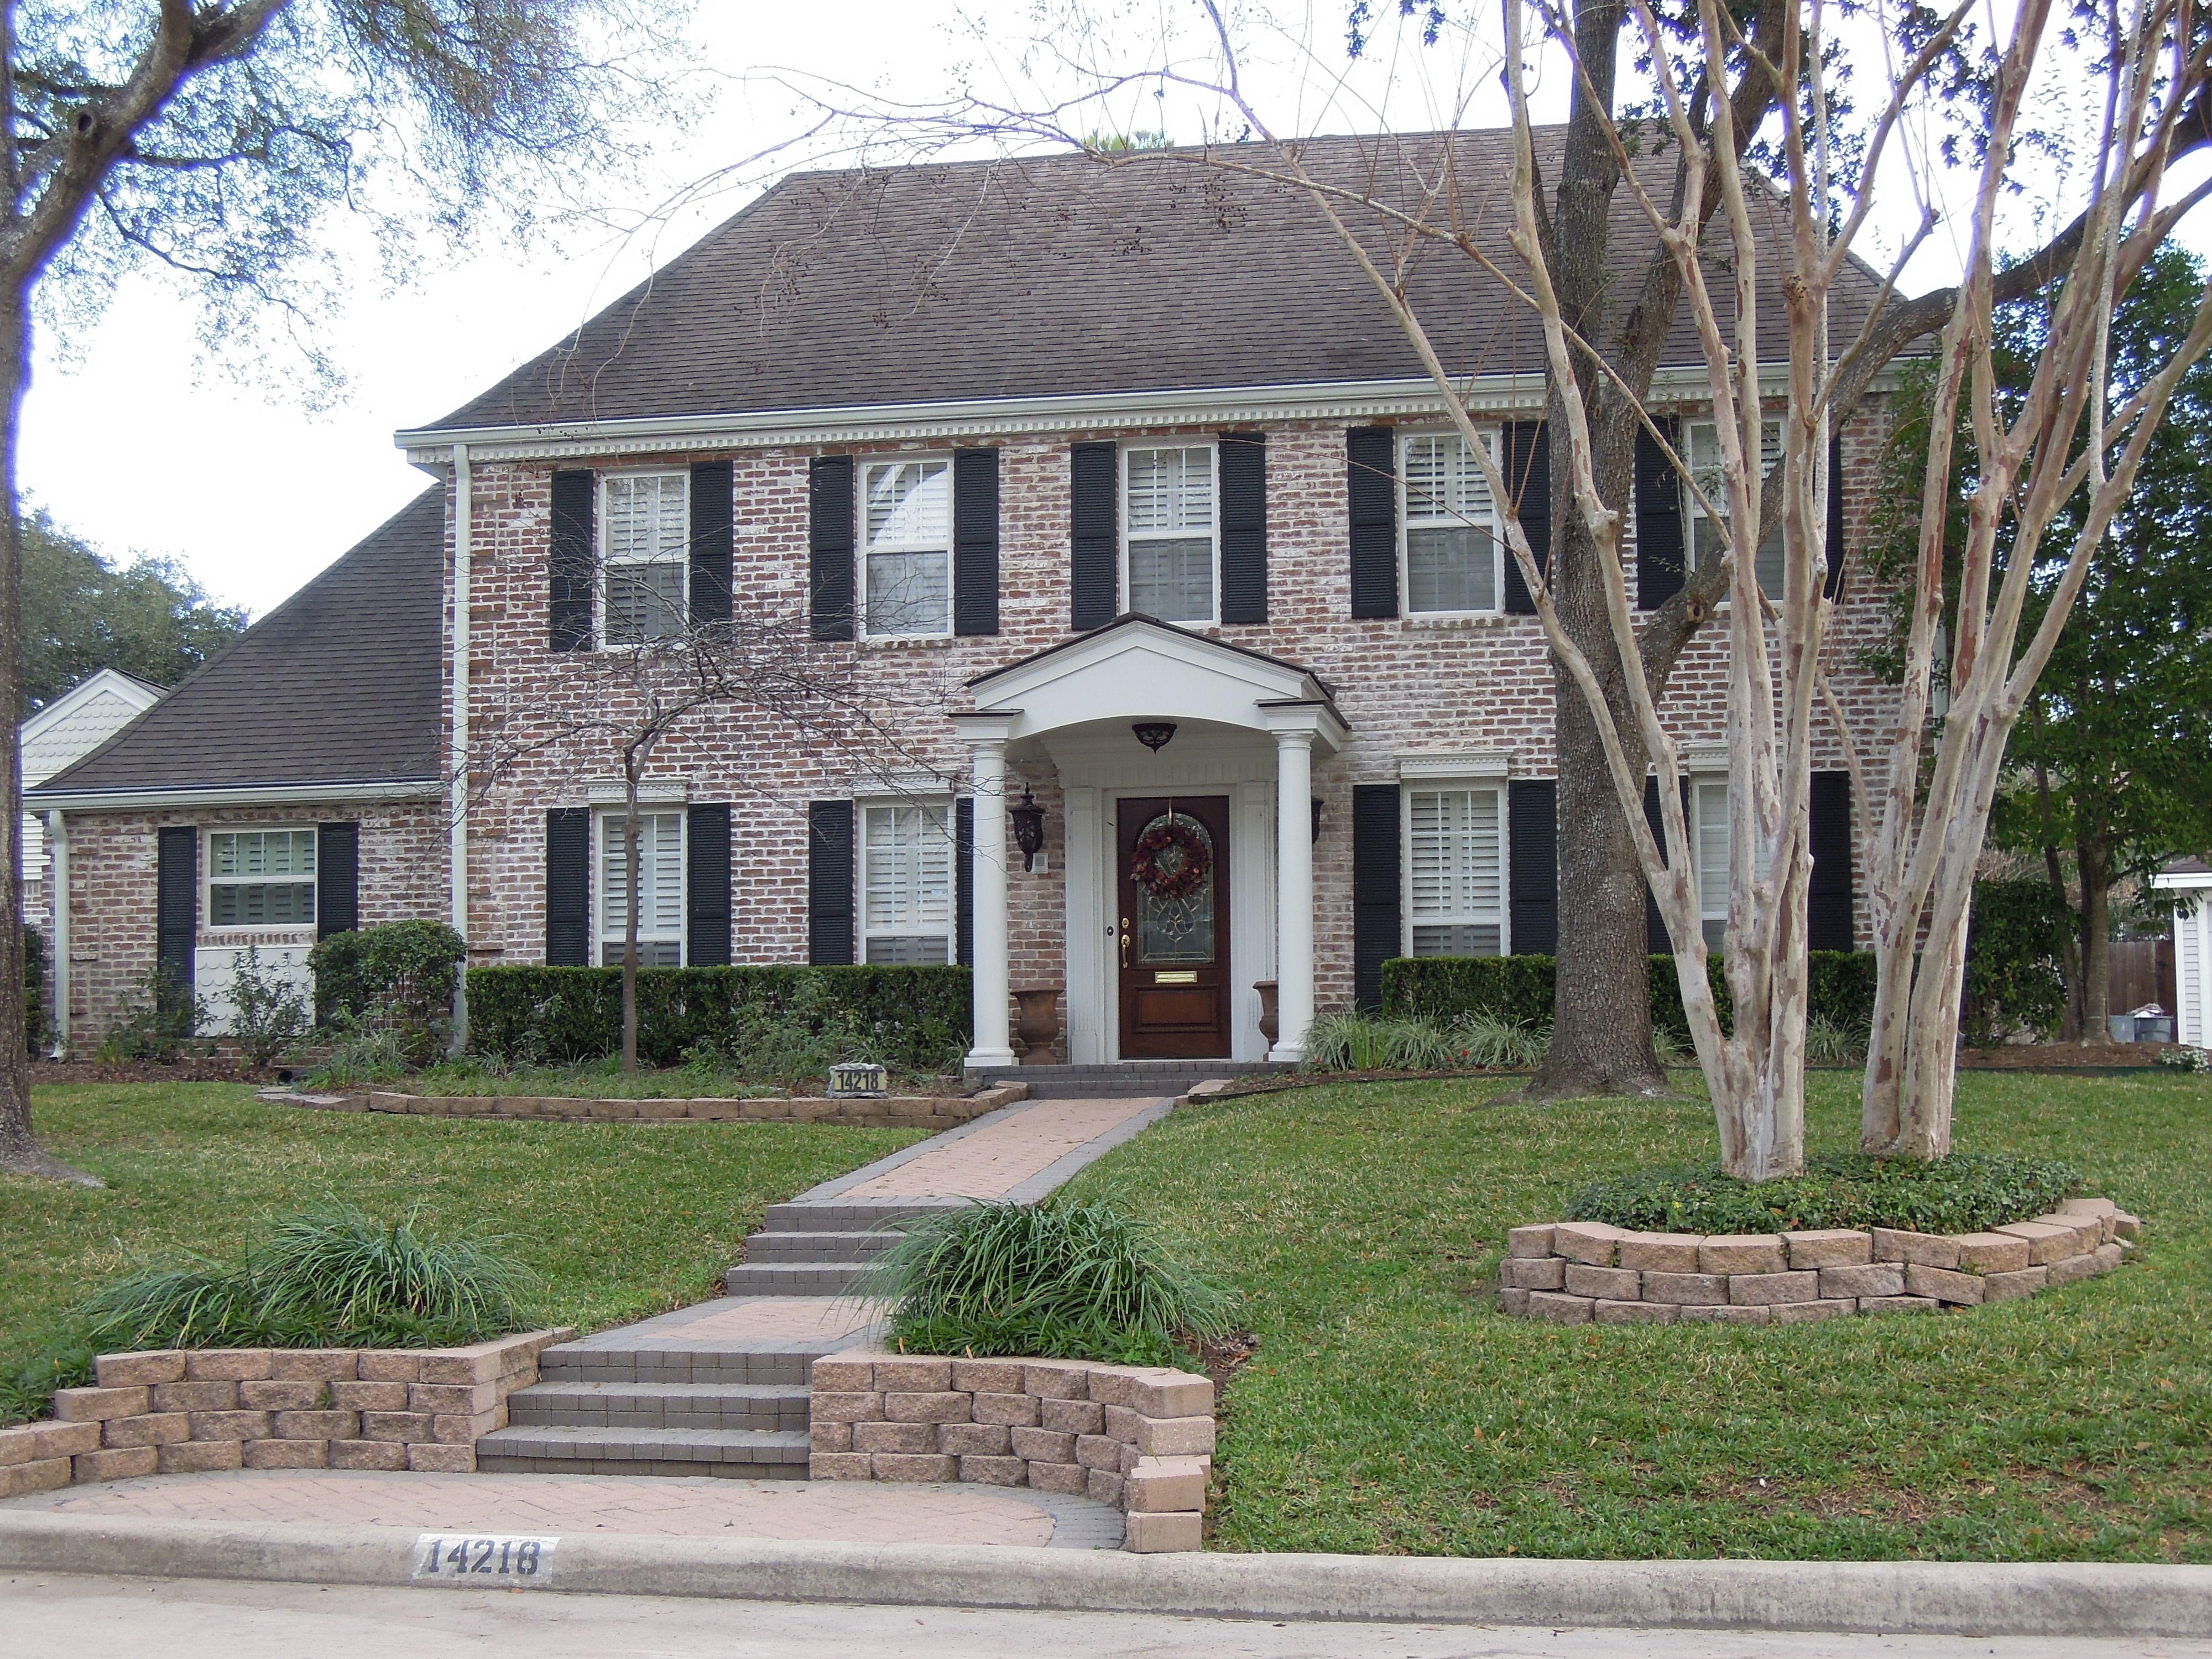 Colonial Exterior Colonial Exterior Whitewash Brick House